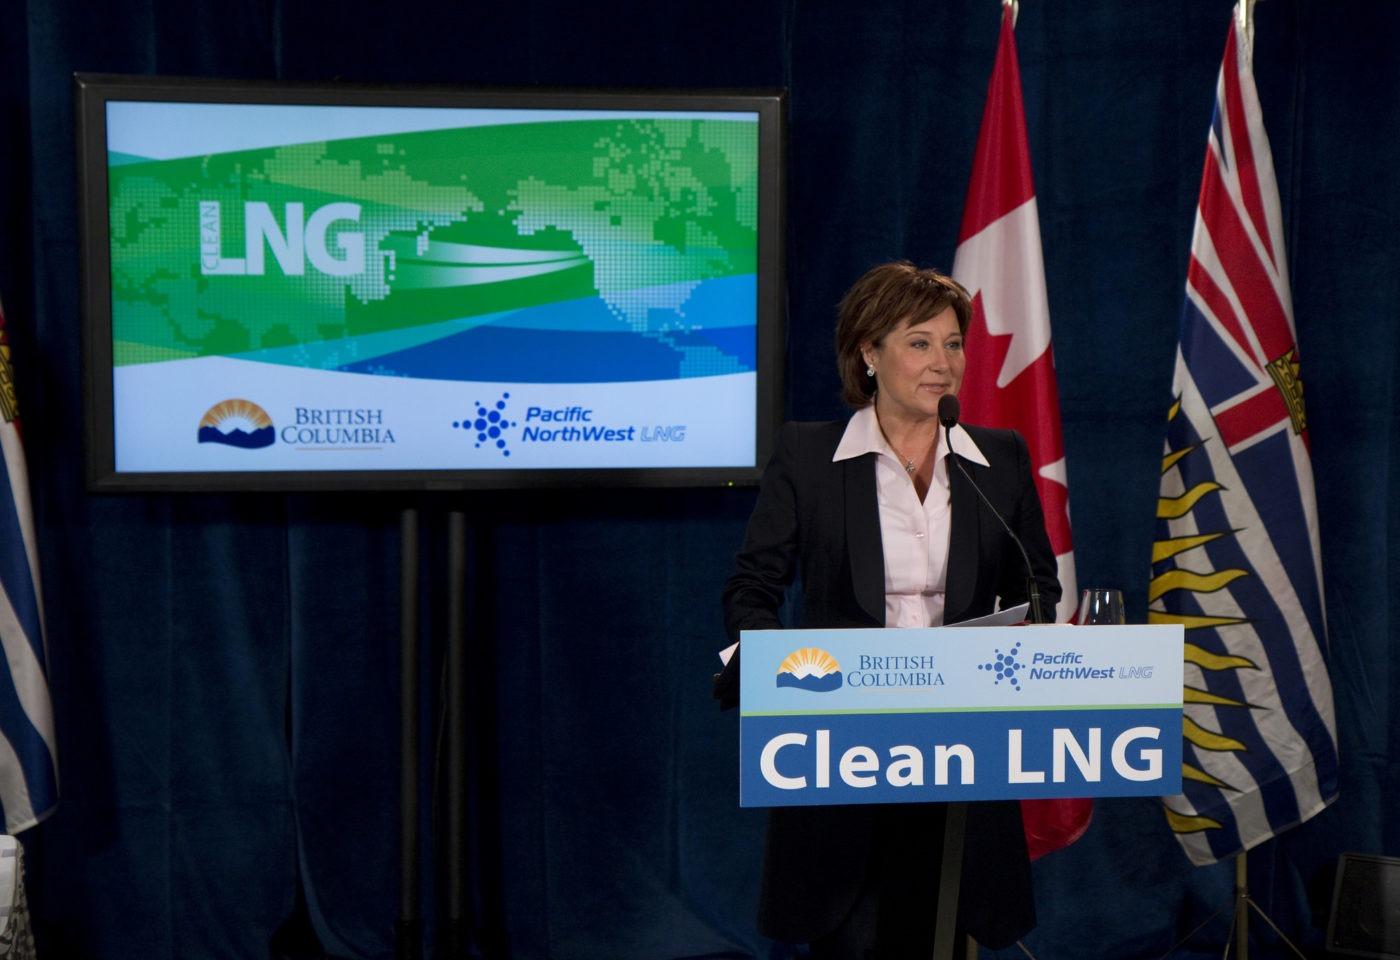 B.C. Premier Christy Clark (Image courtesy Government of British Columbia)